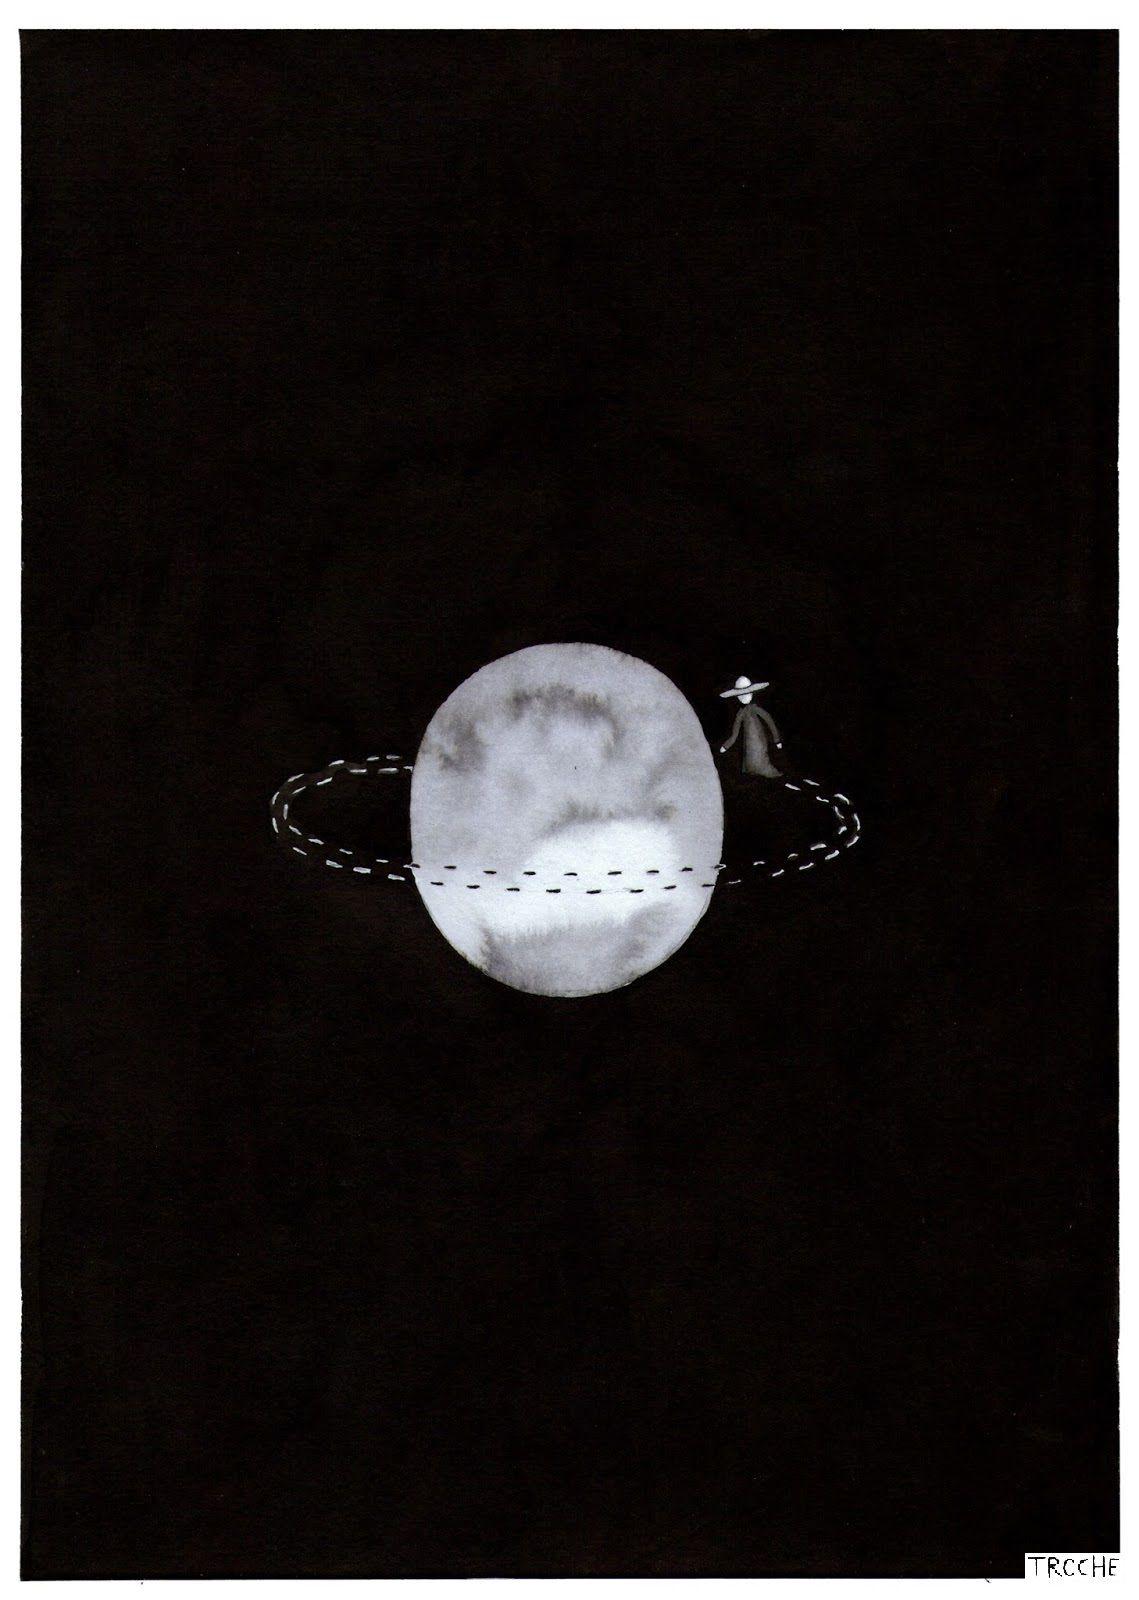 Gervasio Troche (Uruguayan, b. 1976, Buenos Aires, Argentina)  Drawings